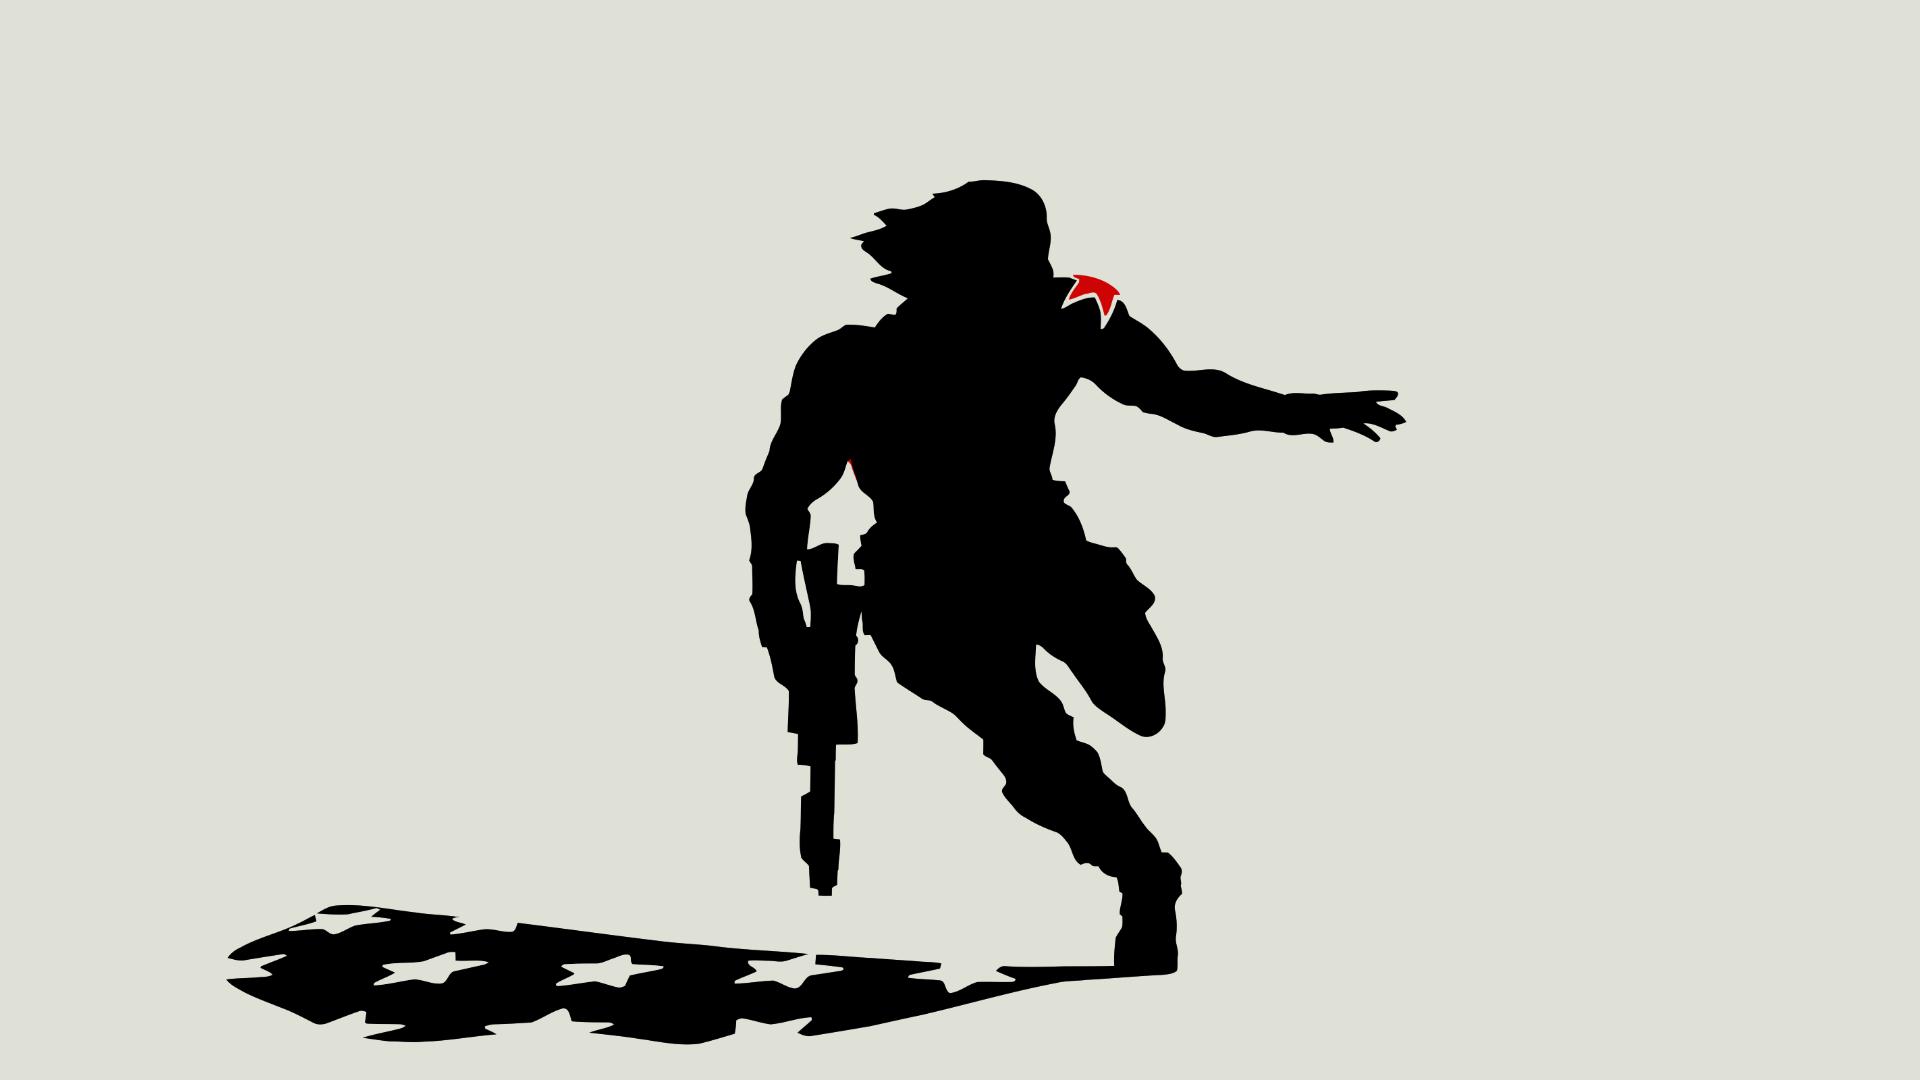 Wallpaper : Captain America The Winter Soldier, Bucky Barnes